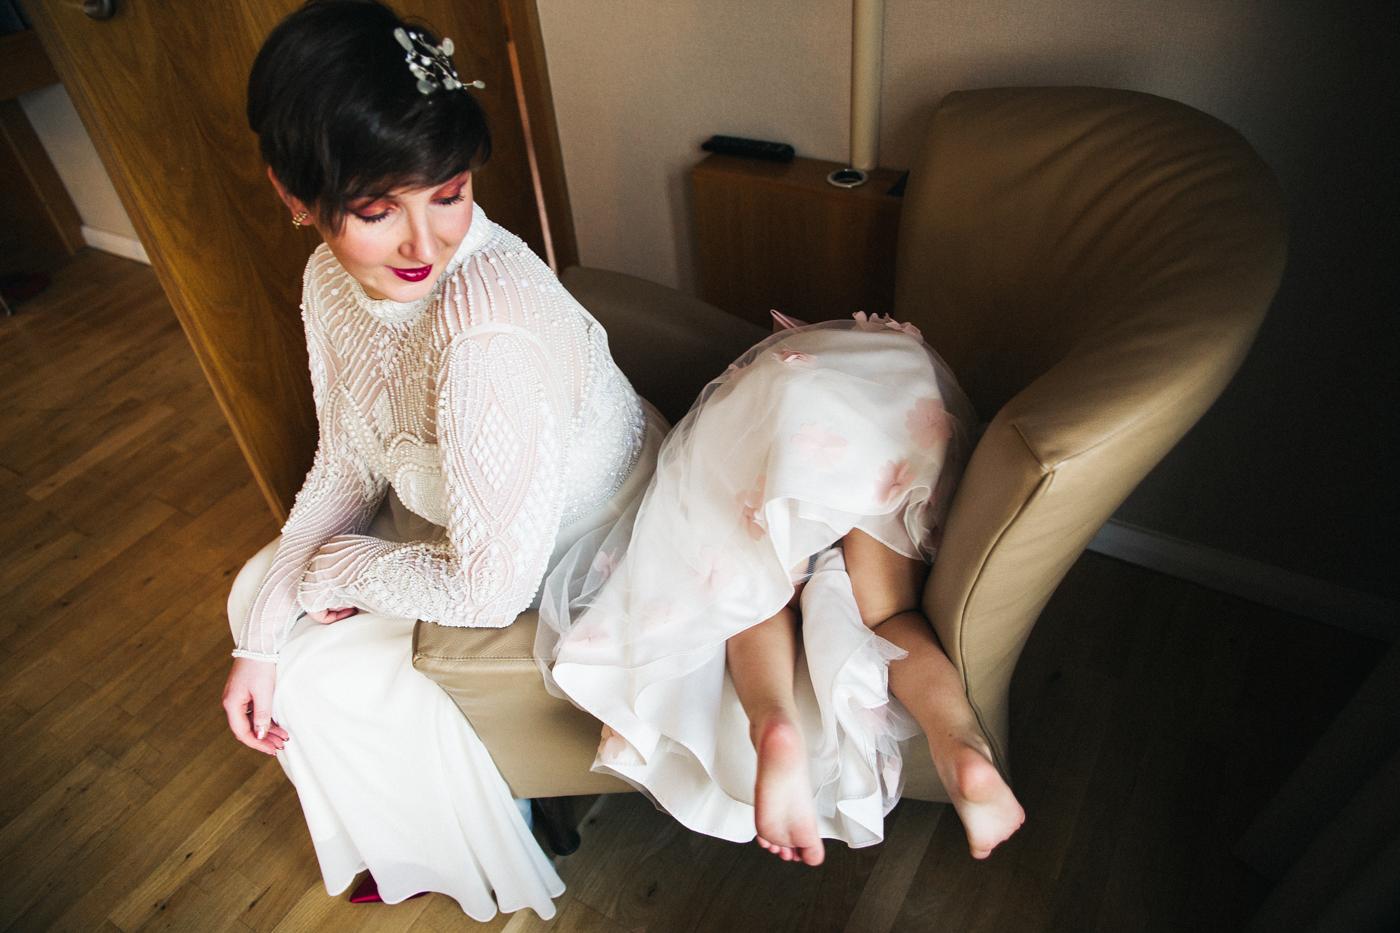 teesside-middlesbrough-north-east-wedding-photographer-creative-wedding-venues-0008.jpg